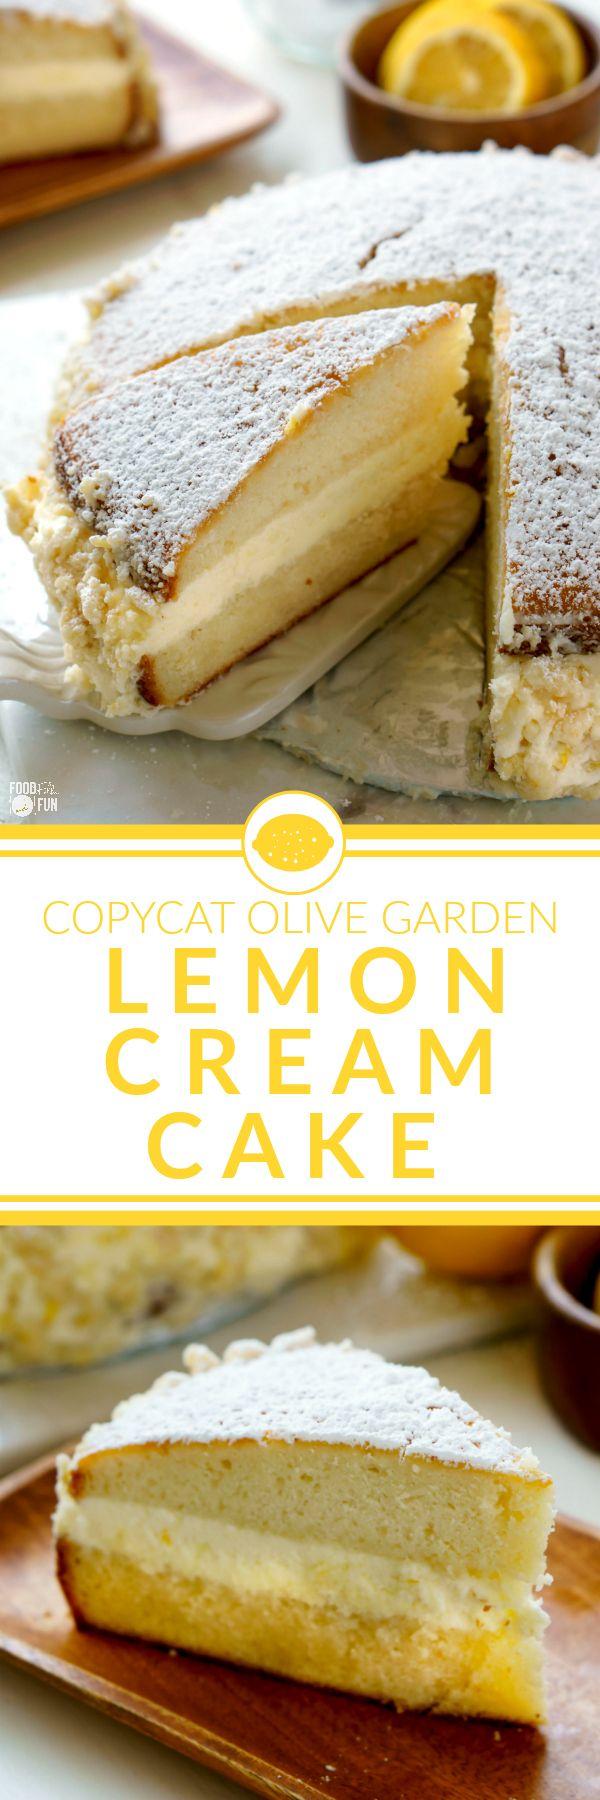 17 best ideas about lemon desserts on pinterest dessert - Olive garden lemon cream cake recipe ...